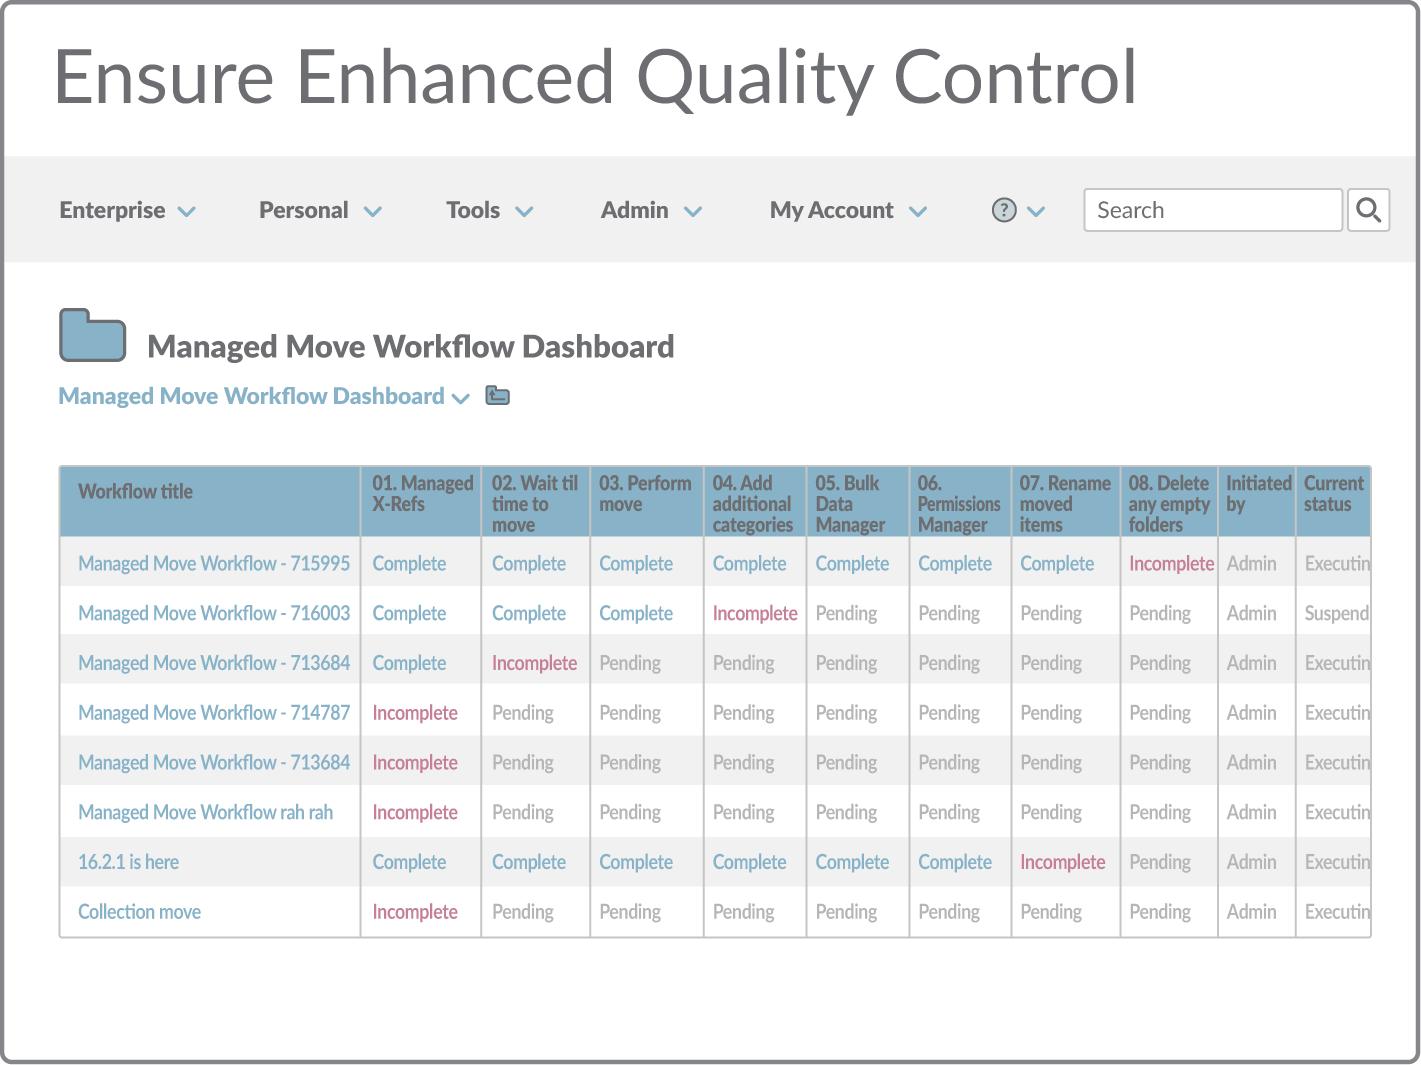 Ensure Enhanced Quality Control